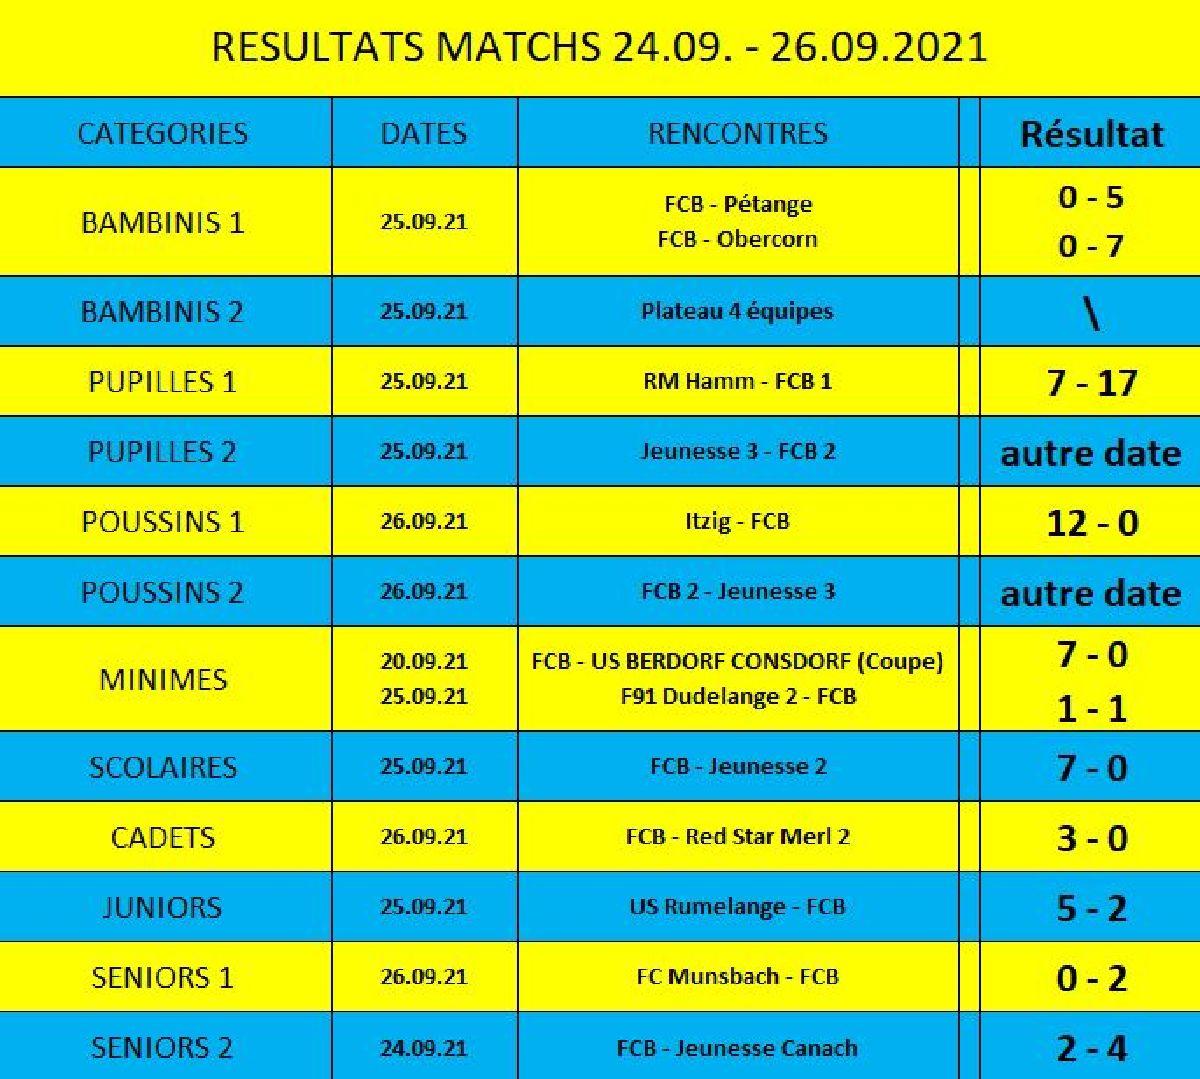 Résultats du weekend 24.09. - 26.09.2021